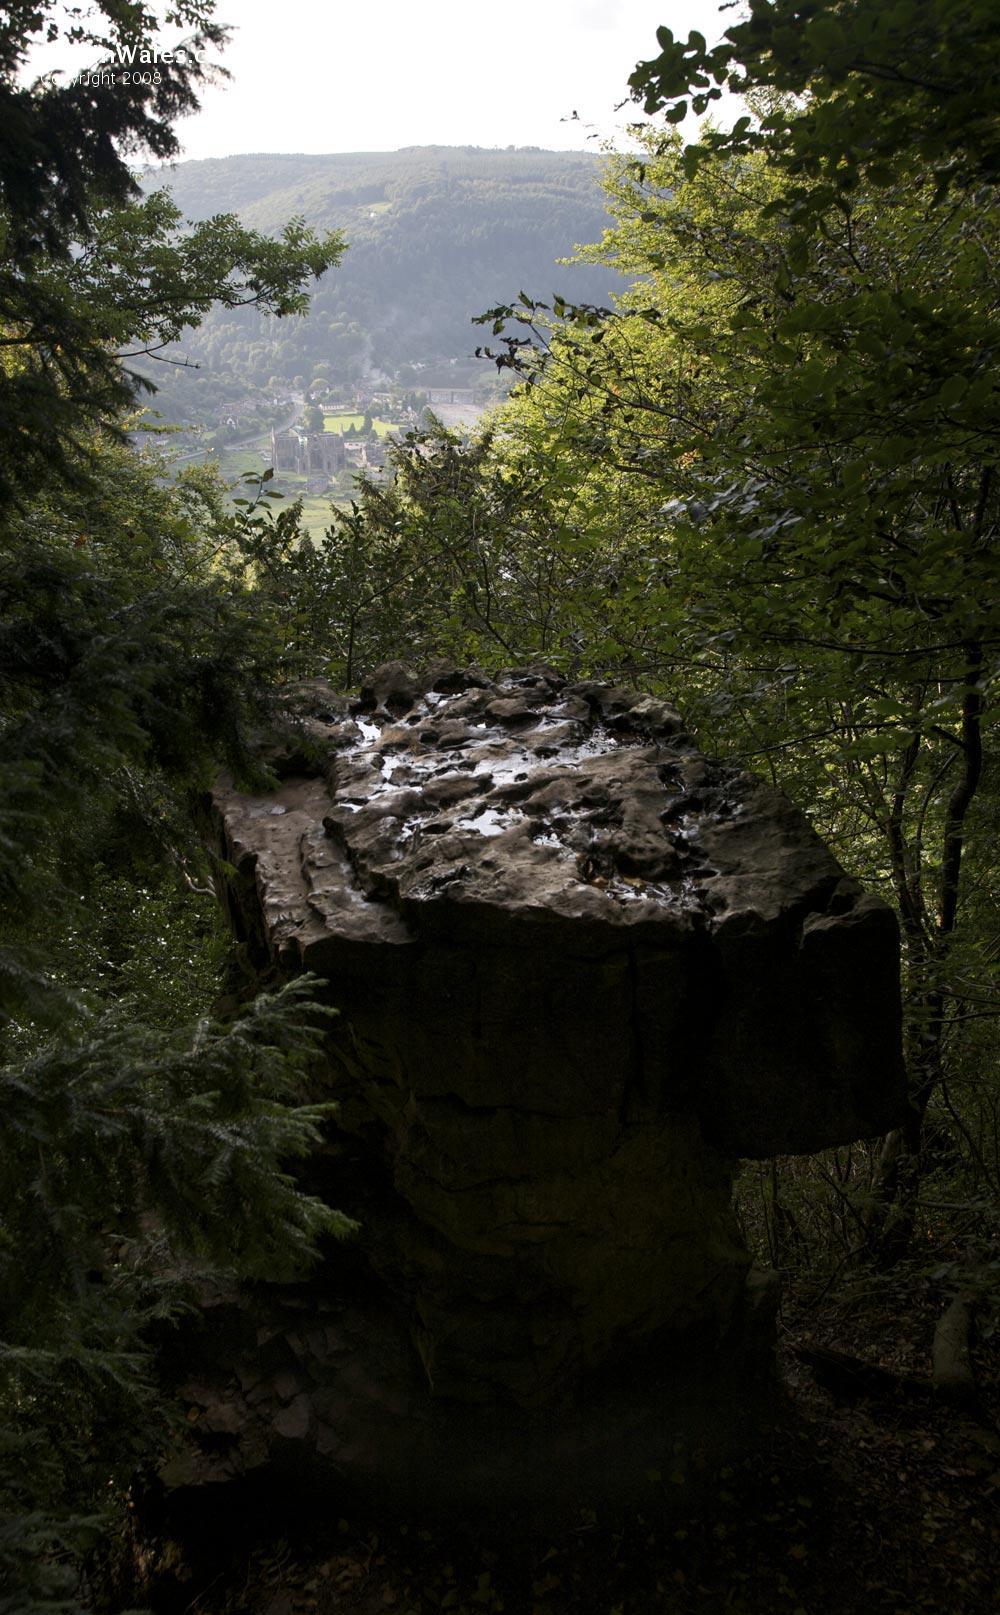 Devil's Pulpit above the Wye Valley near Tintern